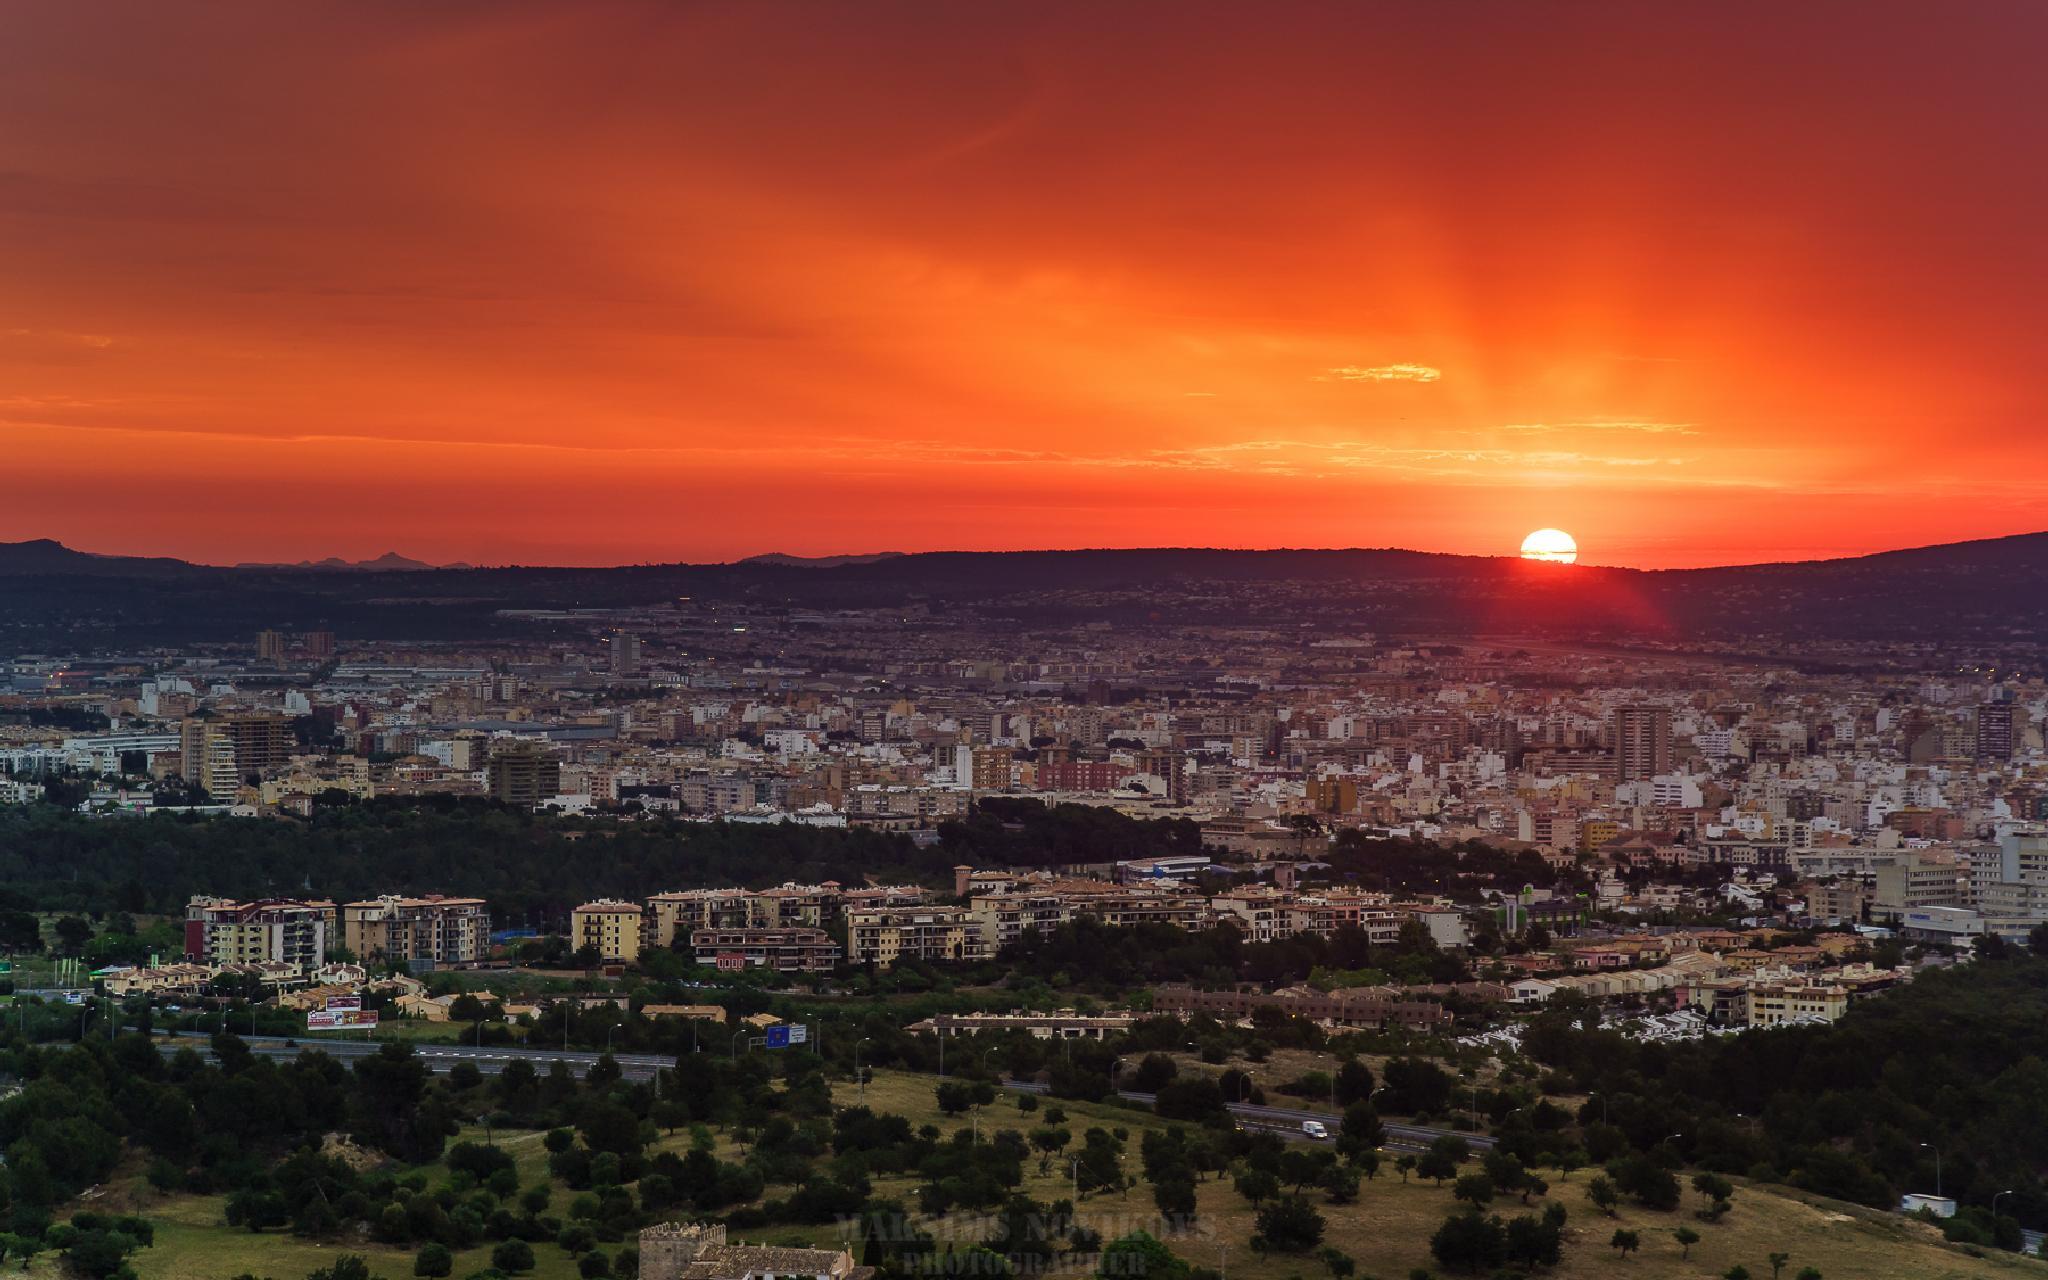 Sunrise Mallorca by Maksims Novikovs